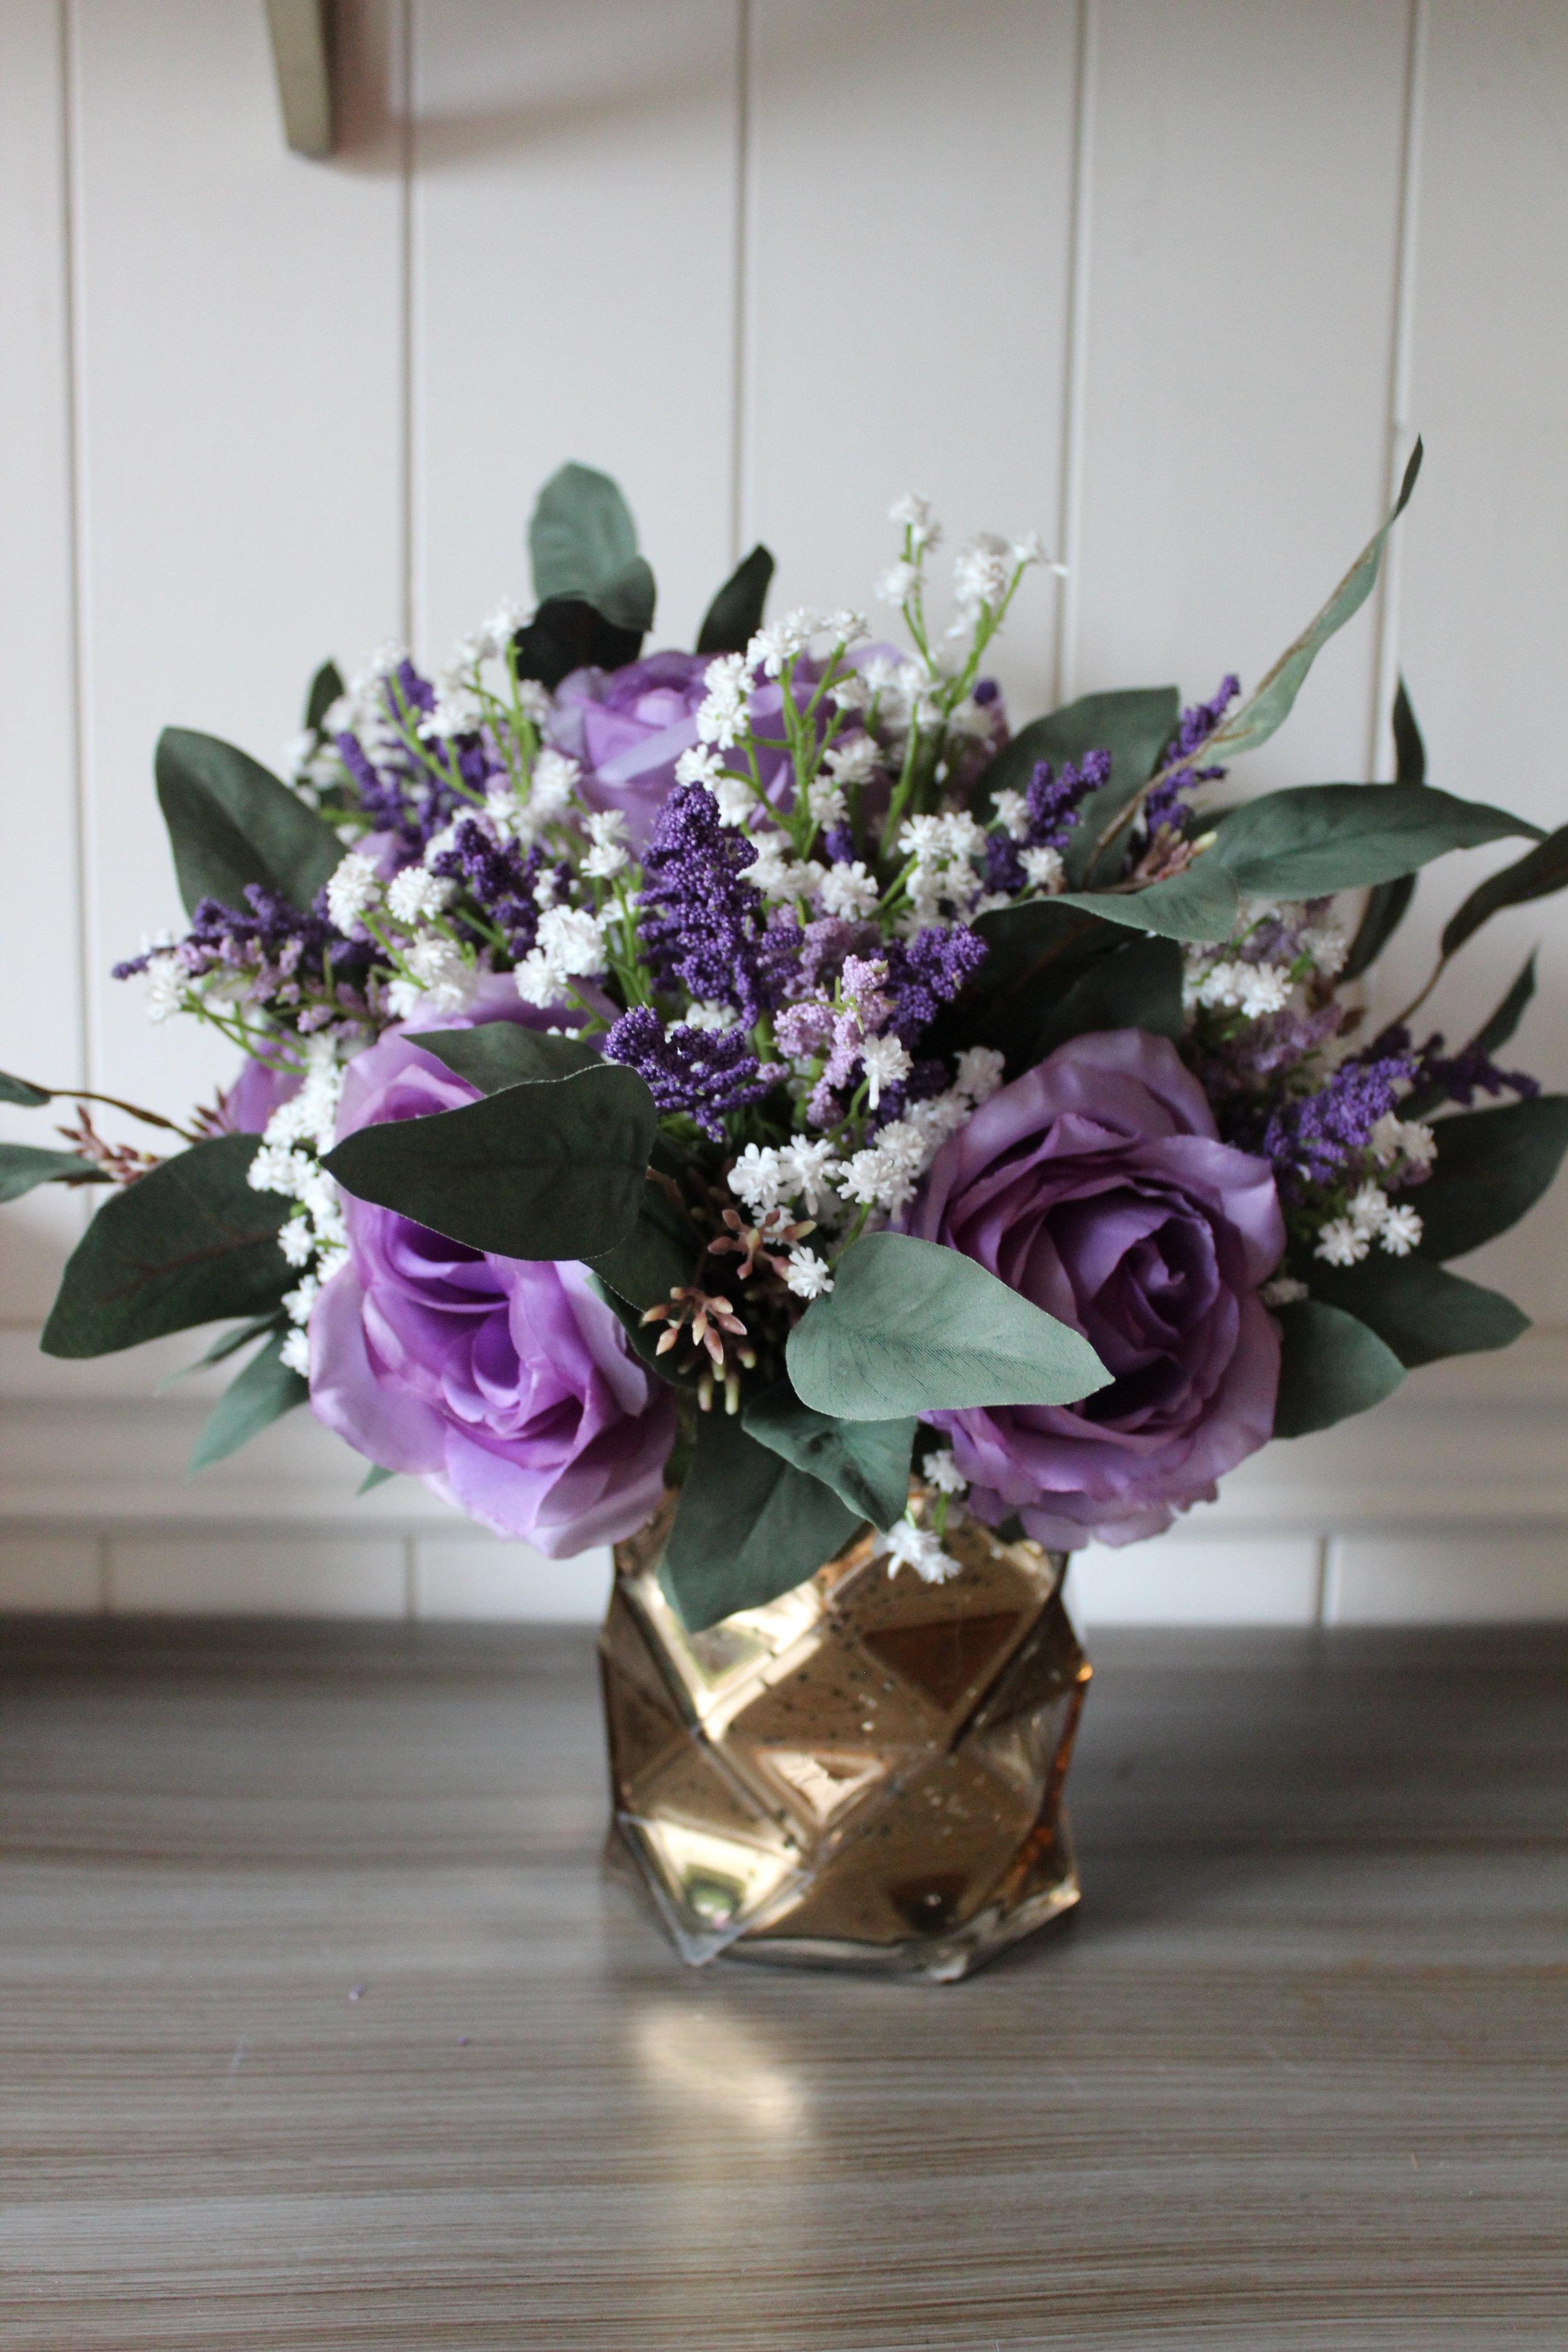 custom-silk-bridal-bouquet-centerpieces-wedding-flowers.jpg